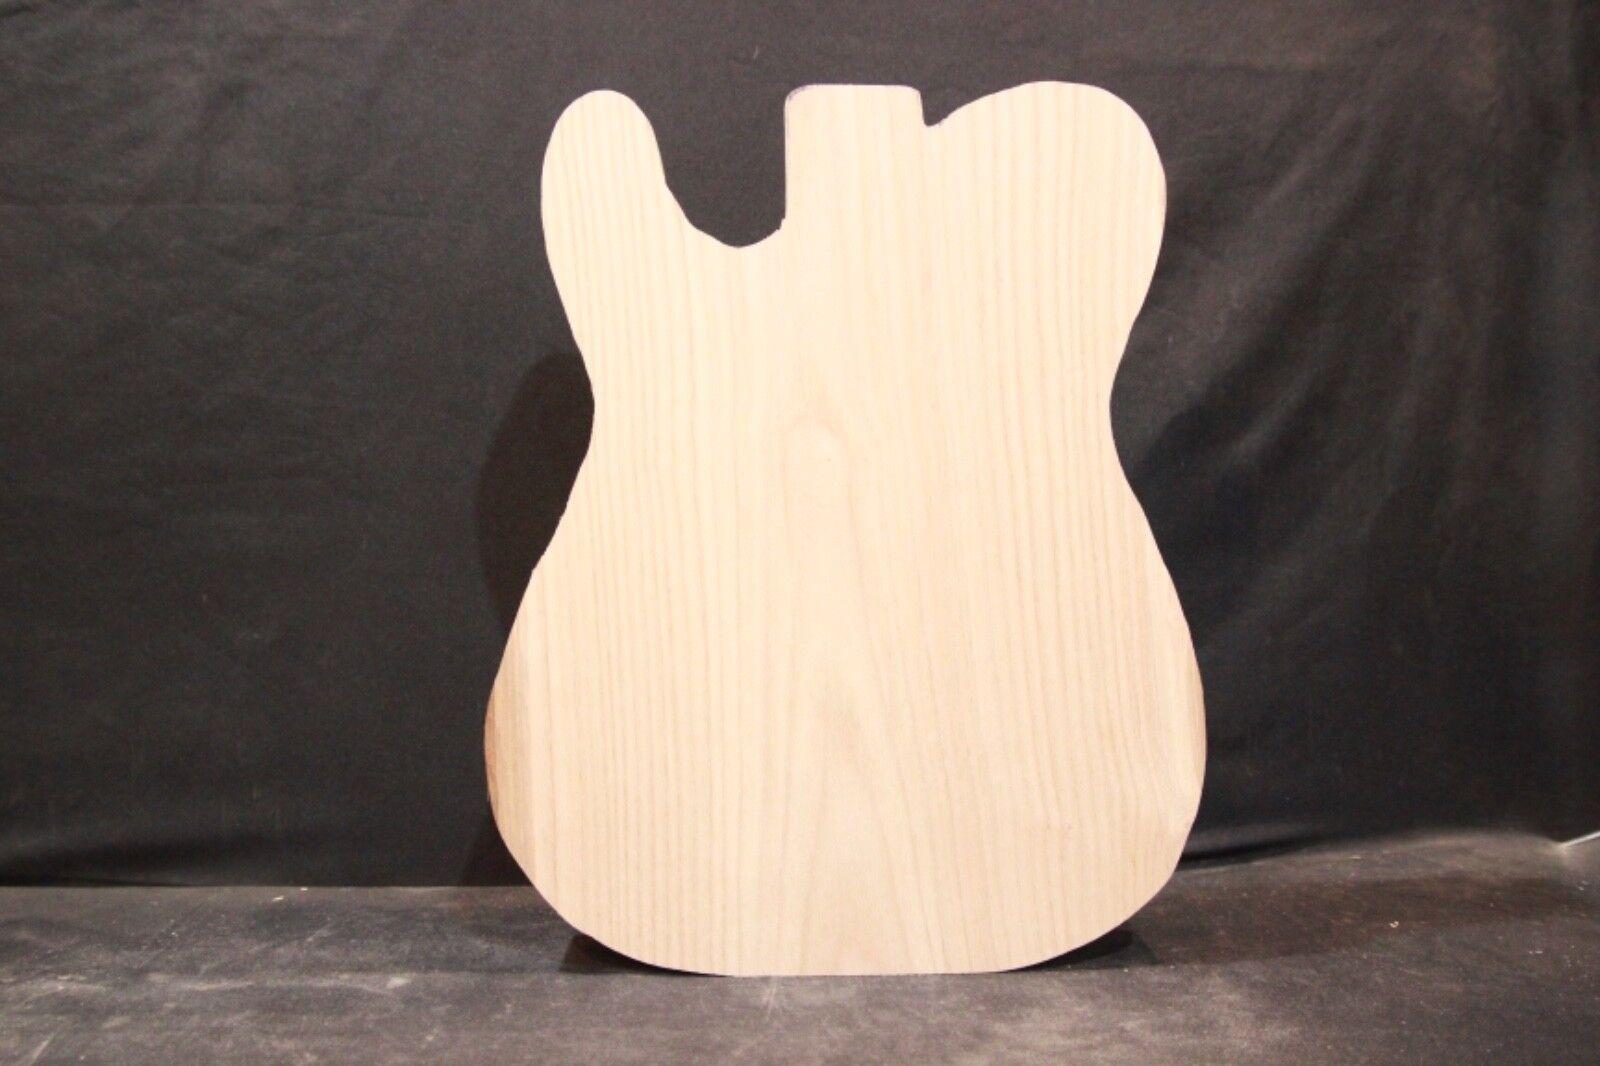 Chestnut 1-piece guitar body blank   Cut to